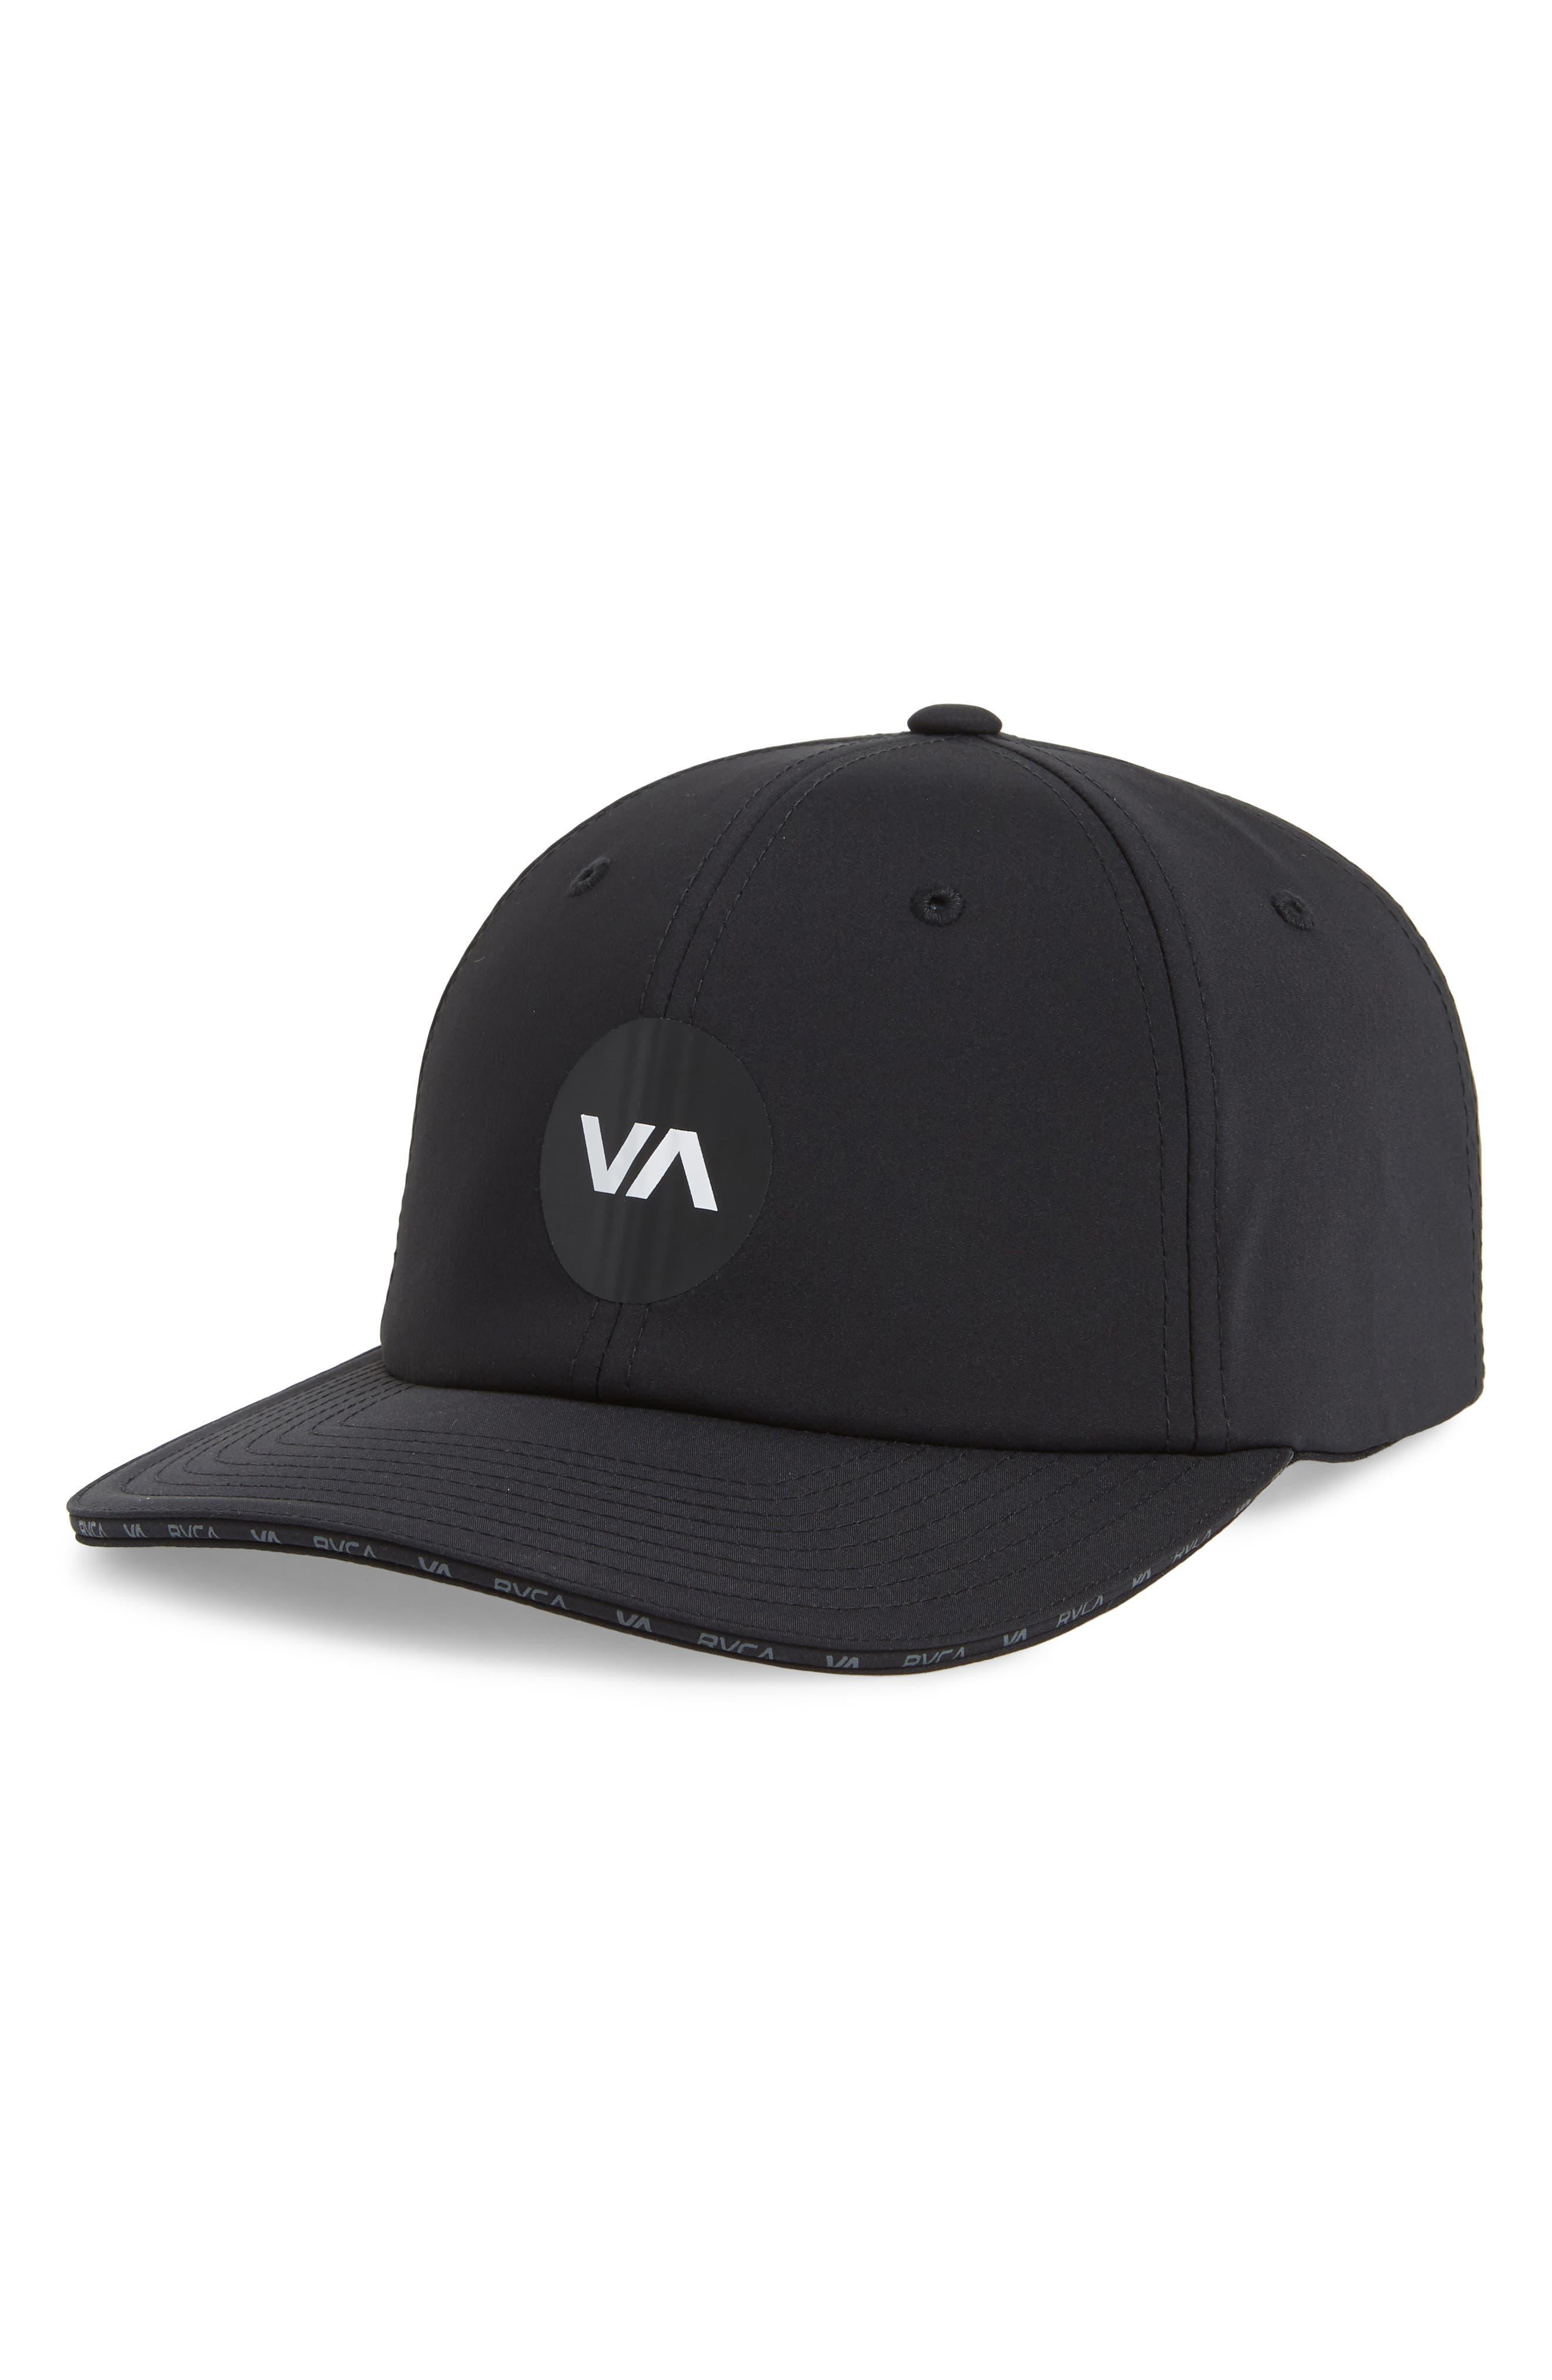 Gym Trainer Ball Cap,                         Main,                         color, Black